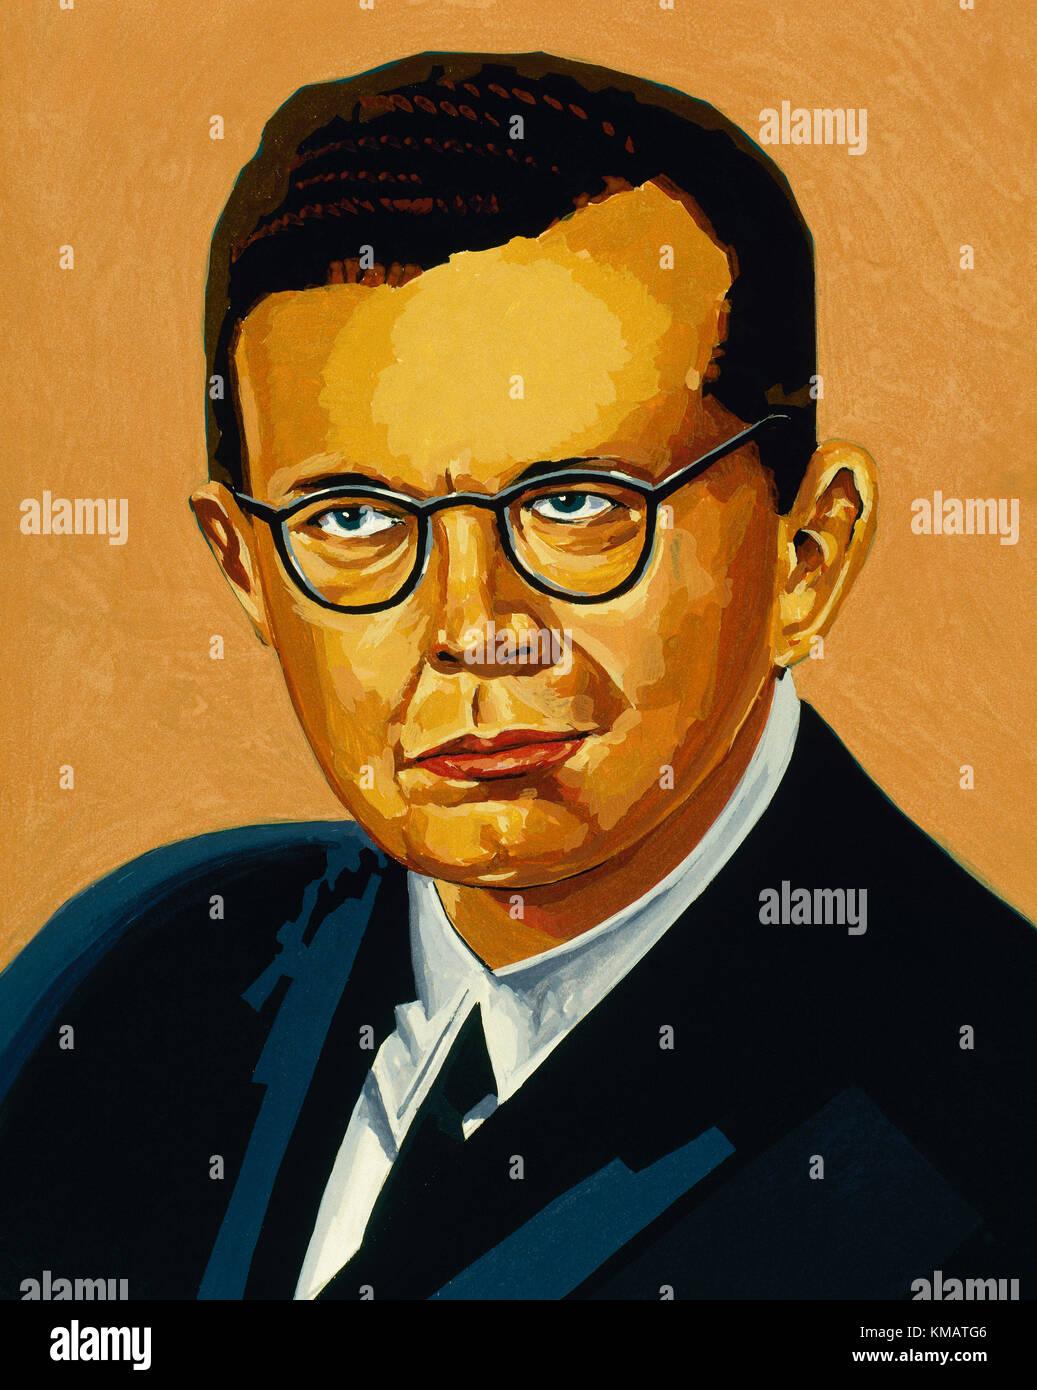 Dmitri Shostakovich(1906-1975). Russian composer and pianist. Portrait. Watercolor. - Stock Image